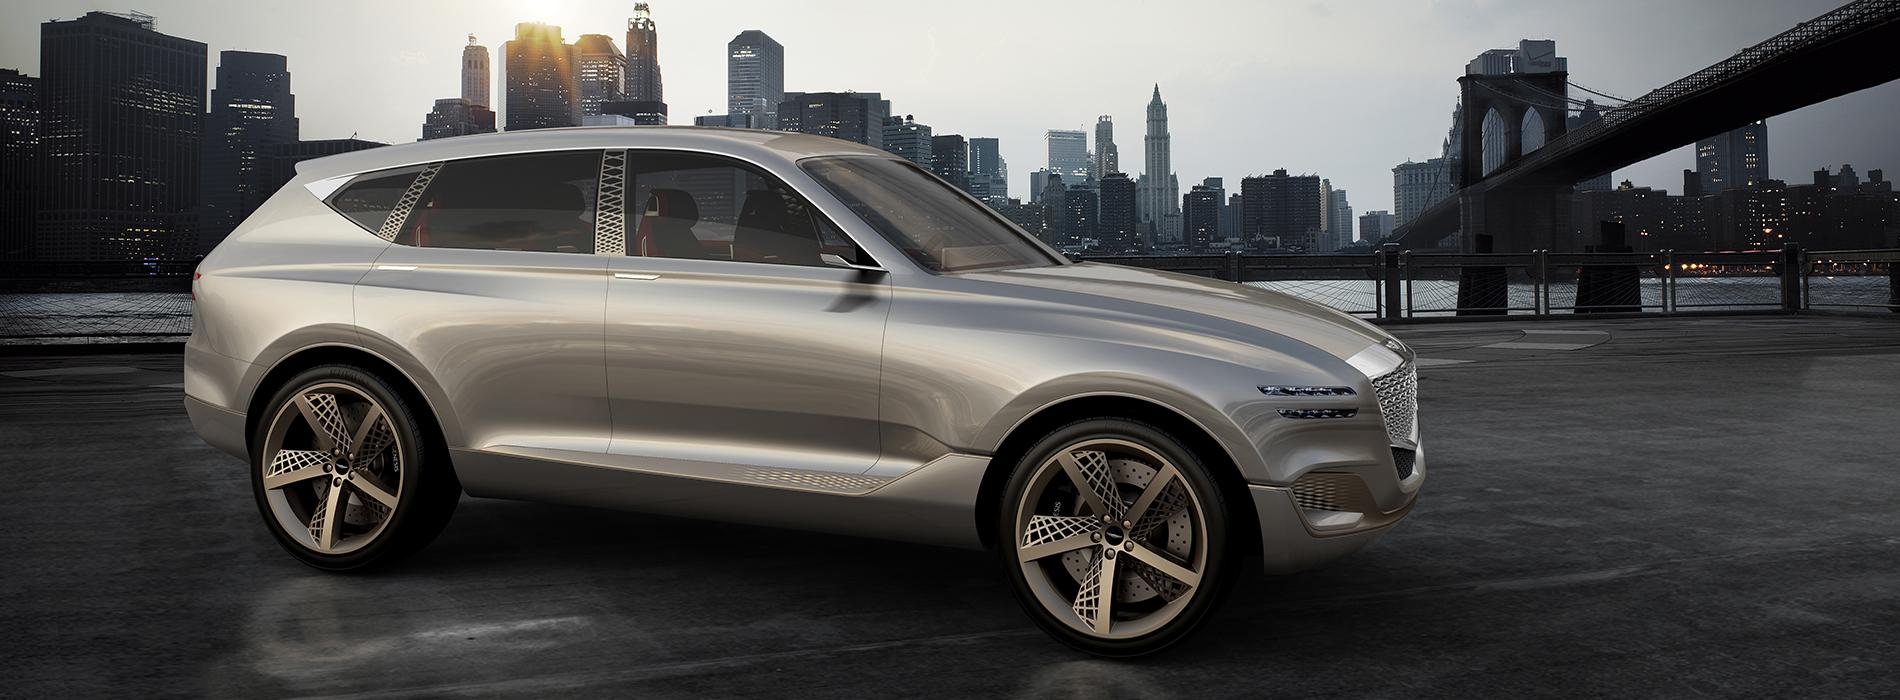 Genesis Reveals Gv Fuel Cell Concept Suv At New York International Auto Show